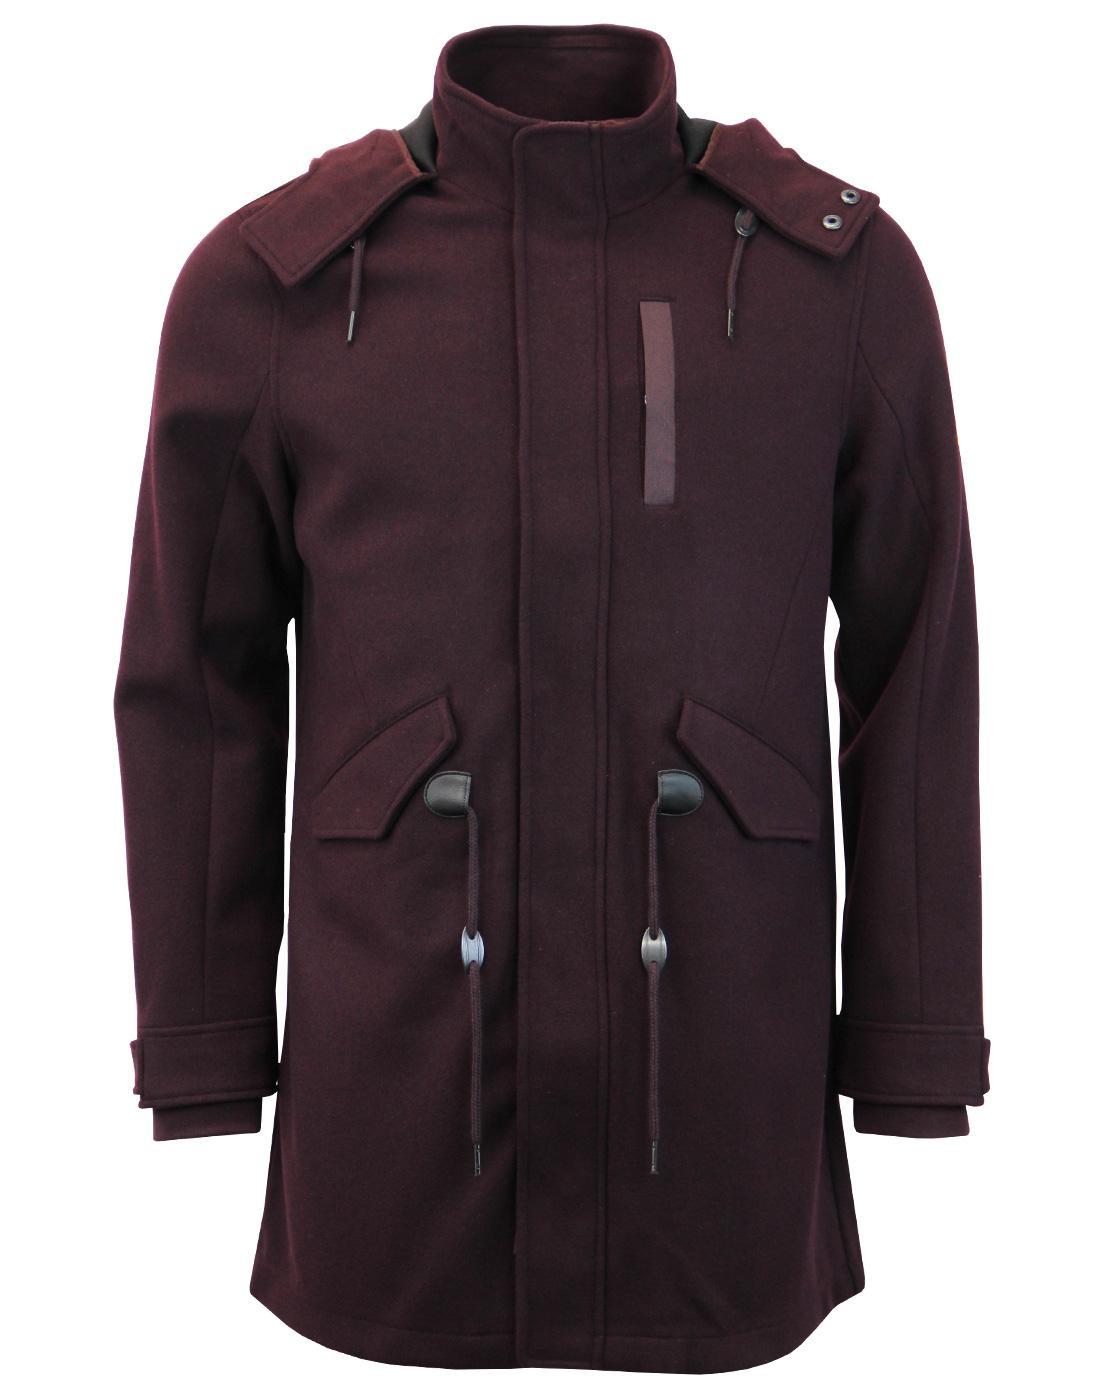 BEN SHERMAN Retro Mod Bonded Wool Parka Jacket (W)